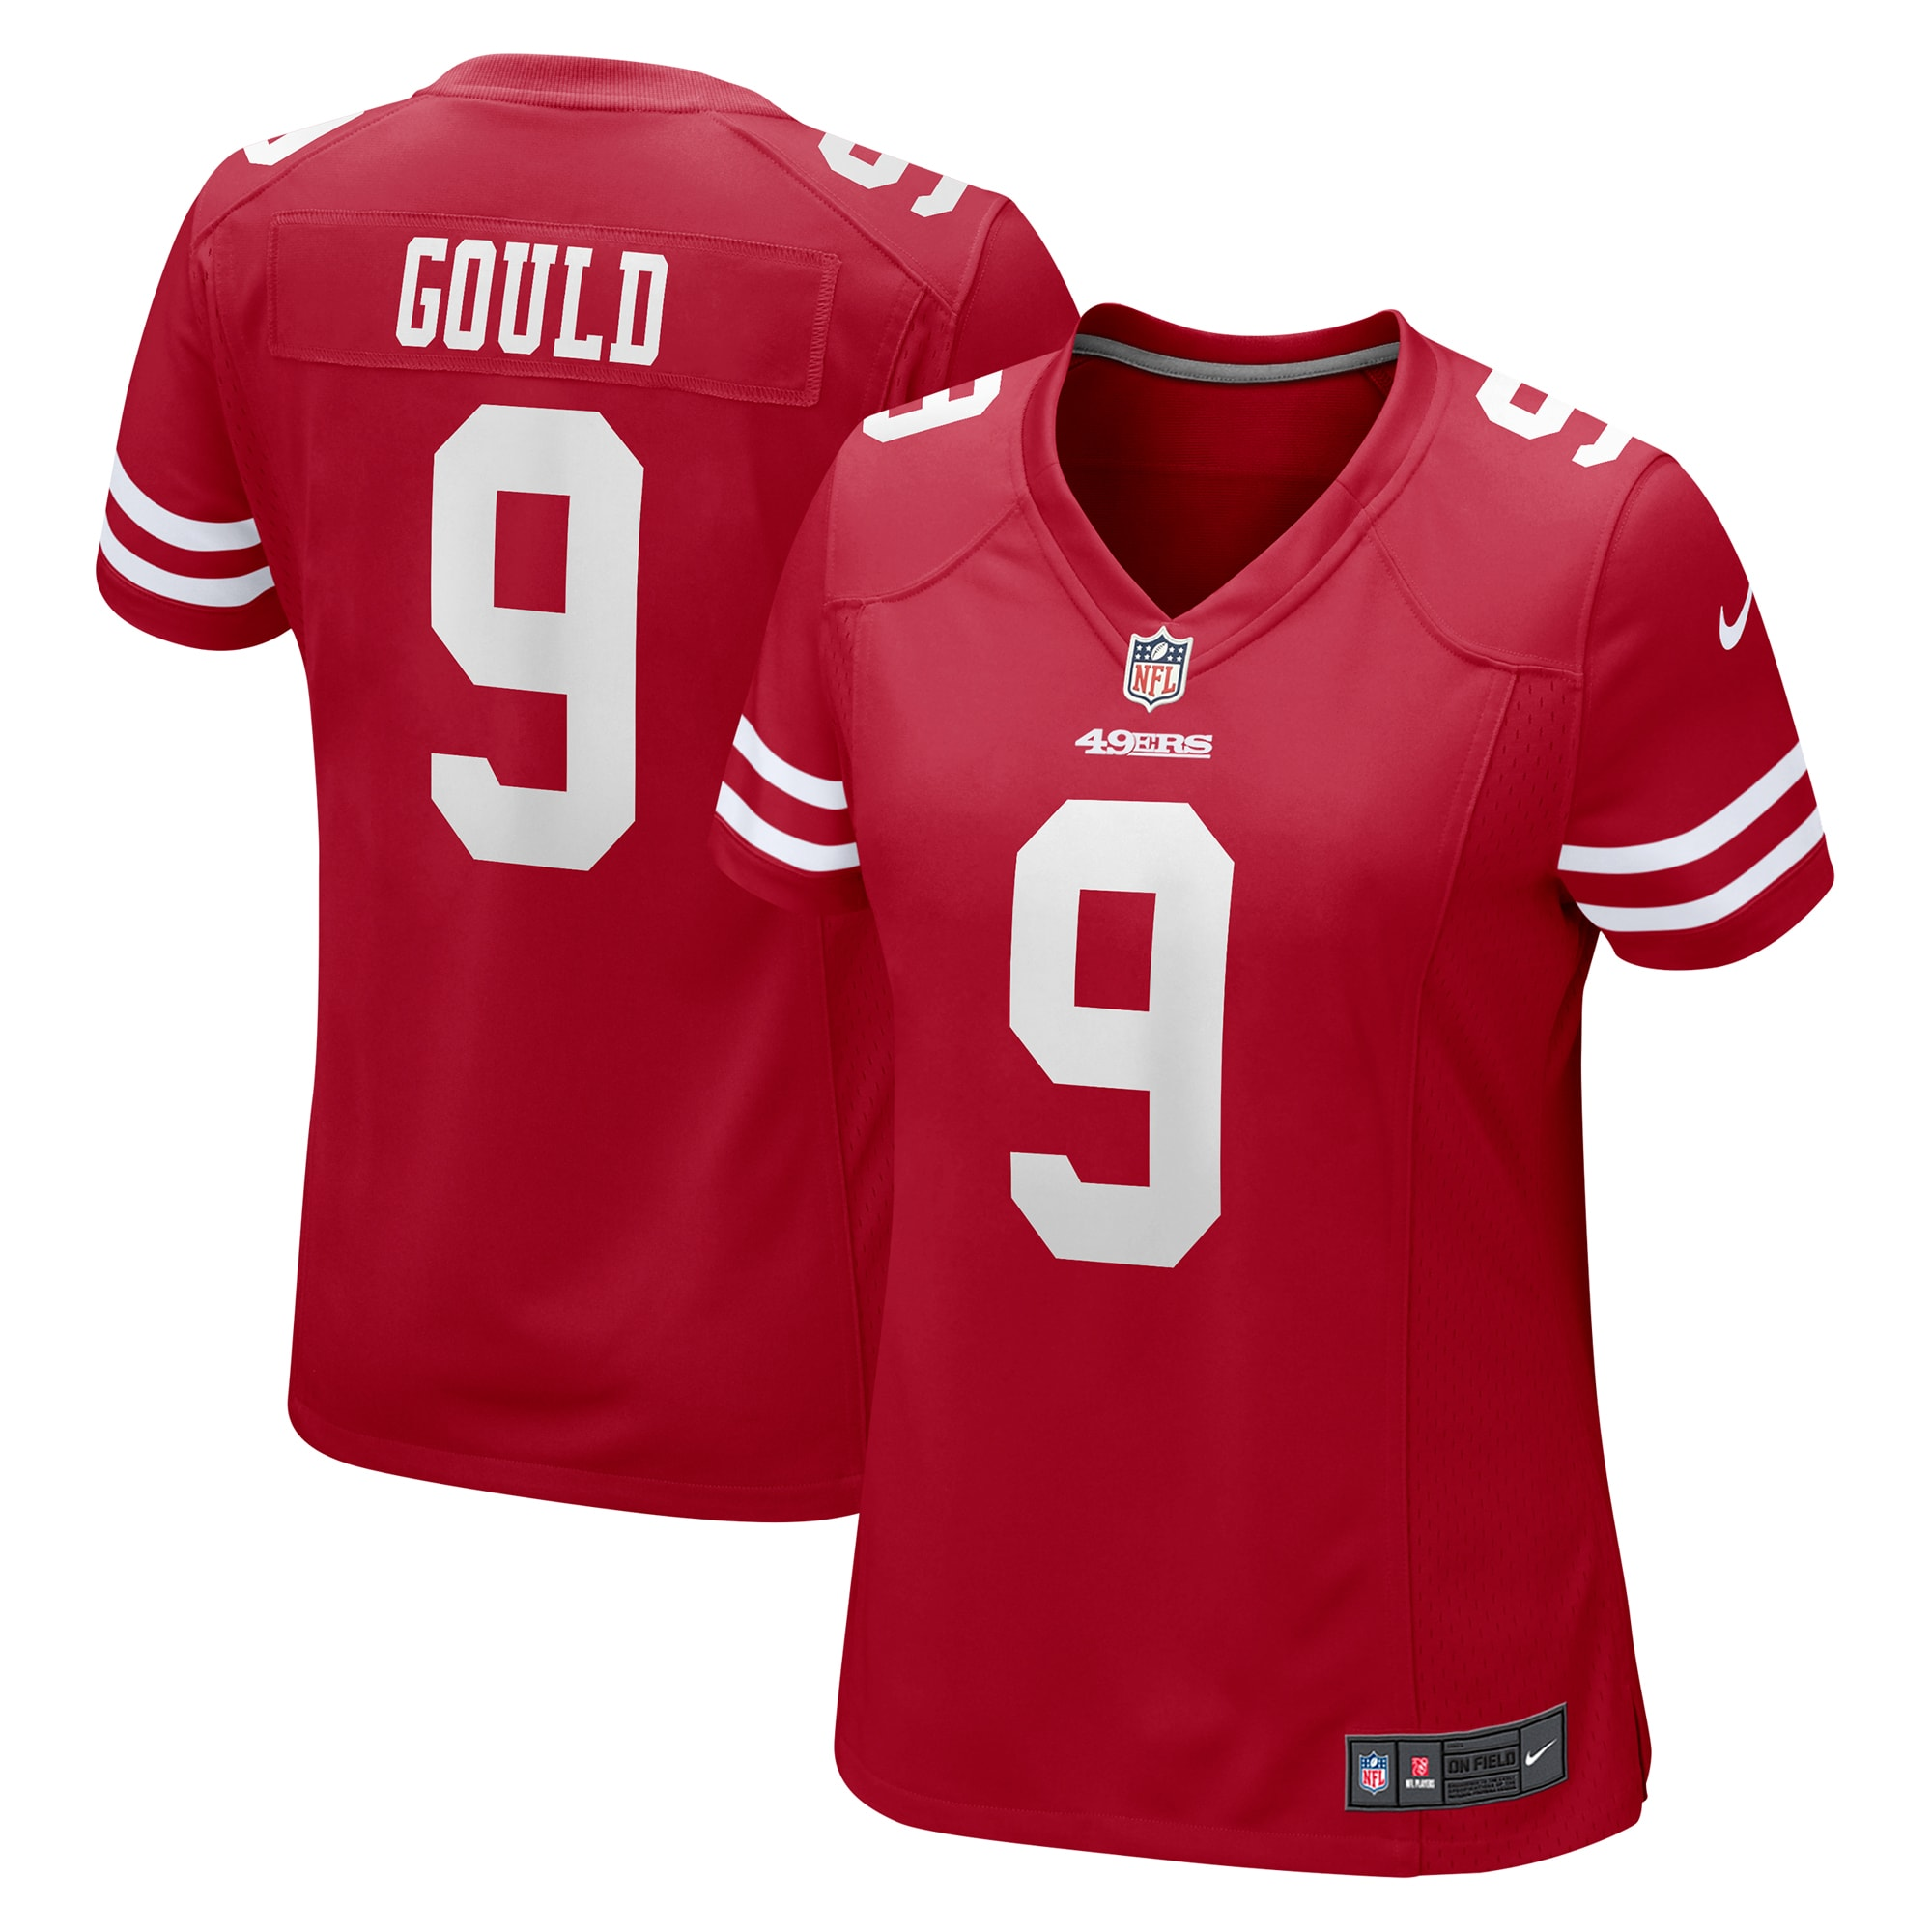 Robbie Gould San Francisco 49ers Nike Women's Game Jersey - Scarlet - Walmart.com